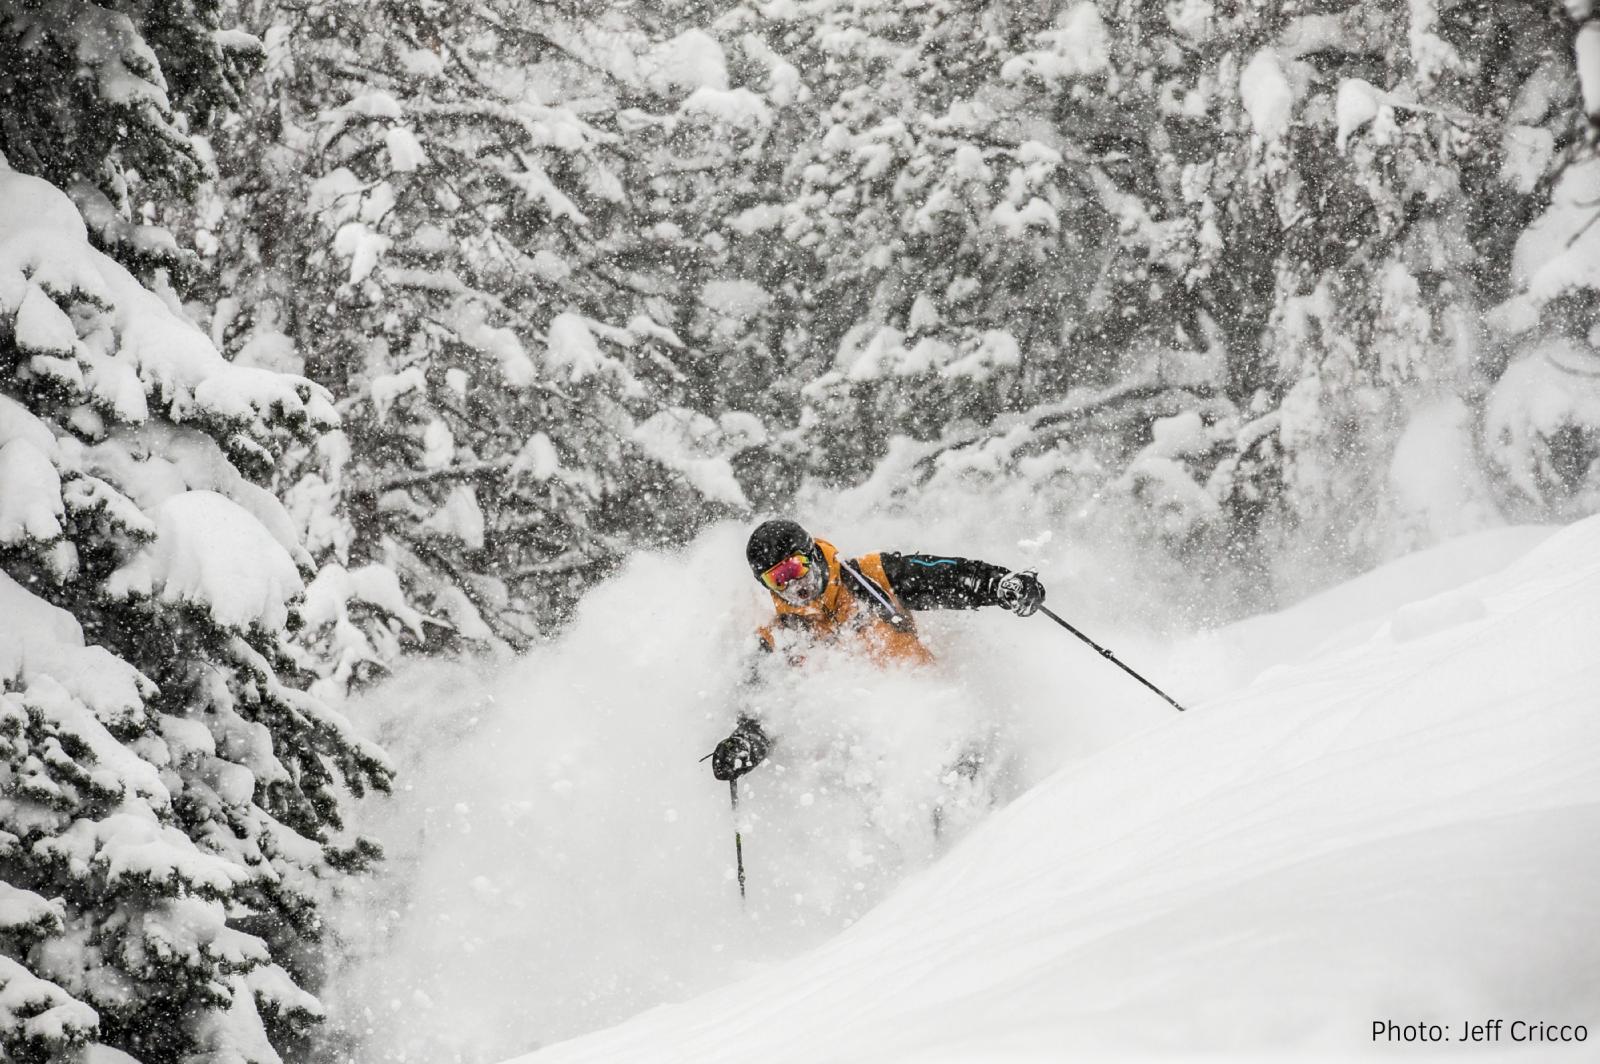 colorado ski resort 2018-2019 projected opening dates | opensnow